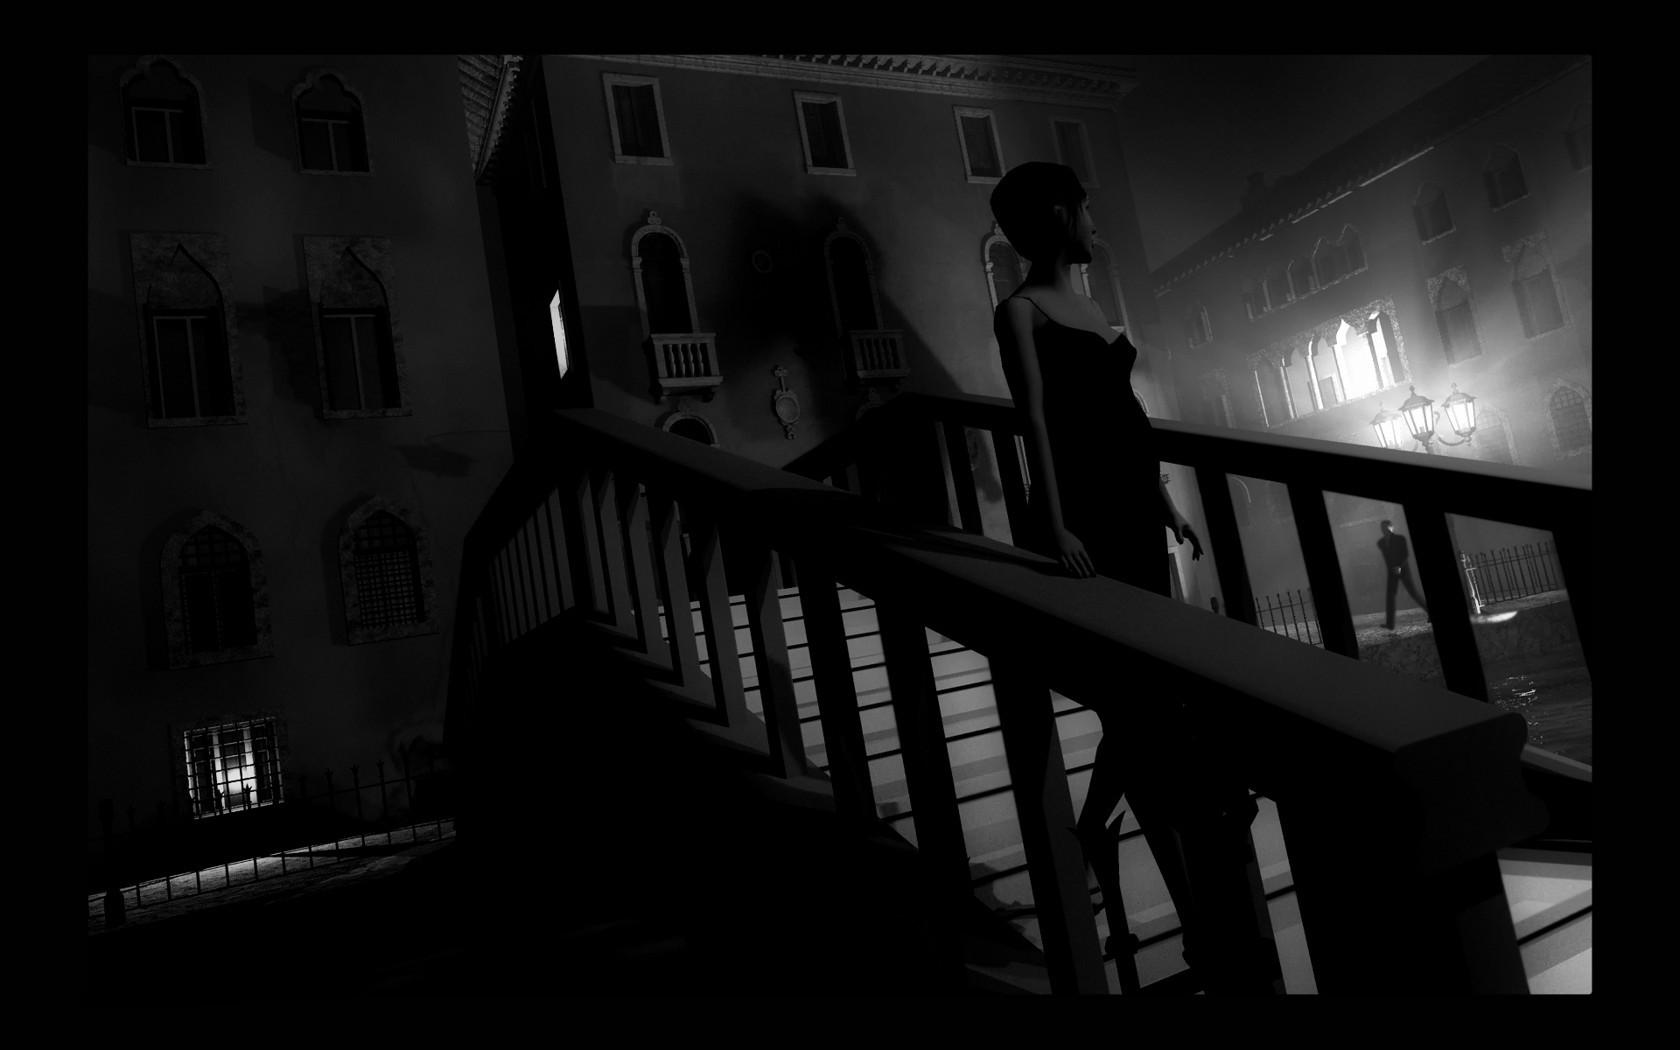 Free Download Noir Hd Wallpaper Film Noir Wallpaper